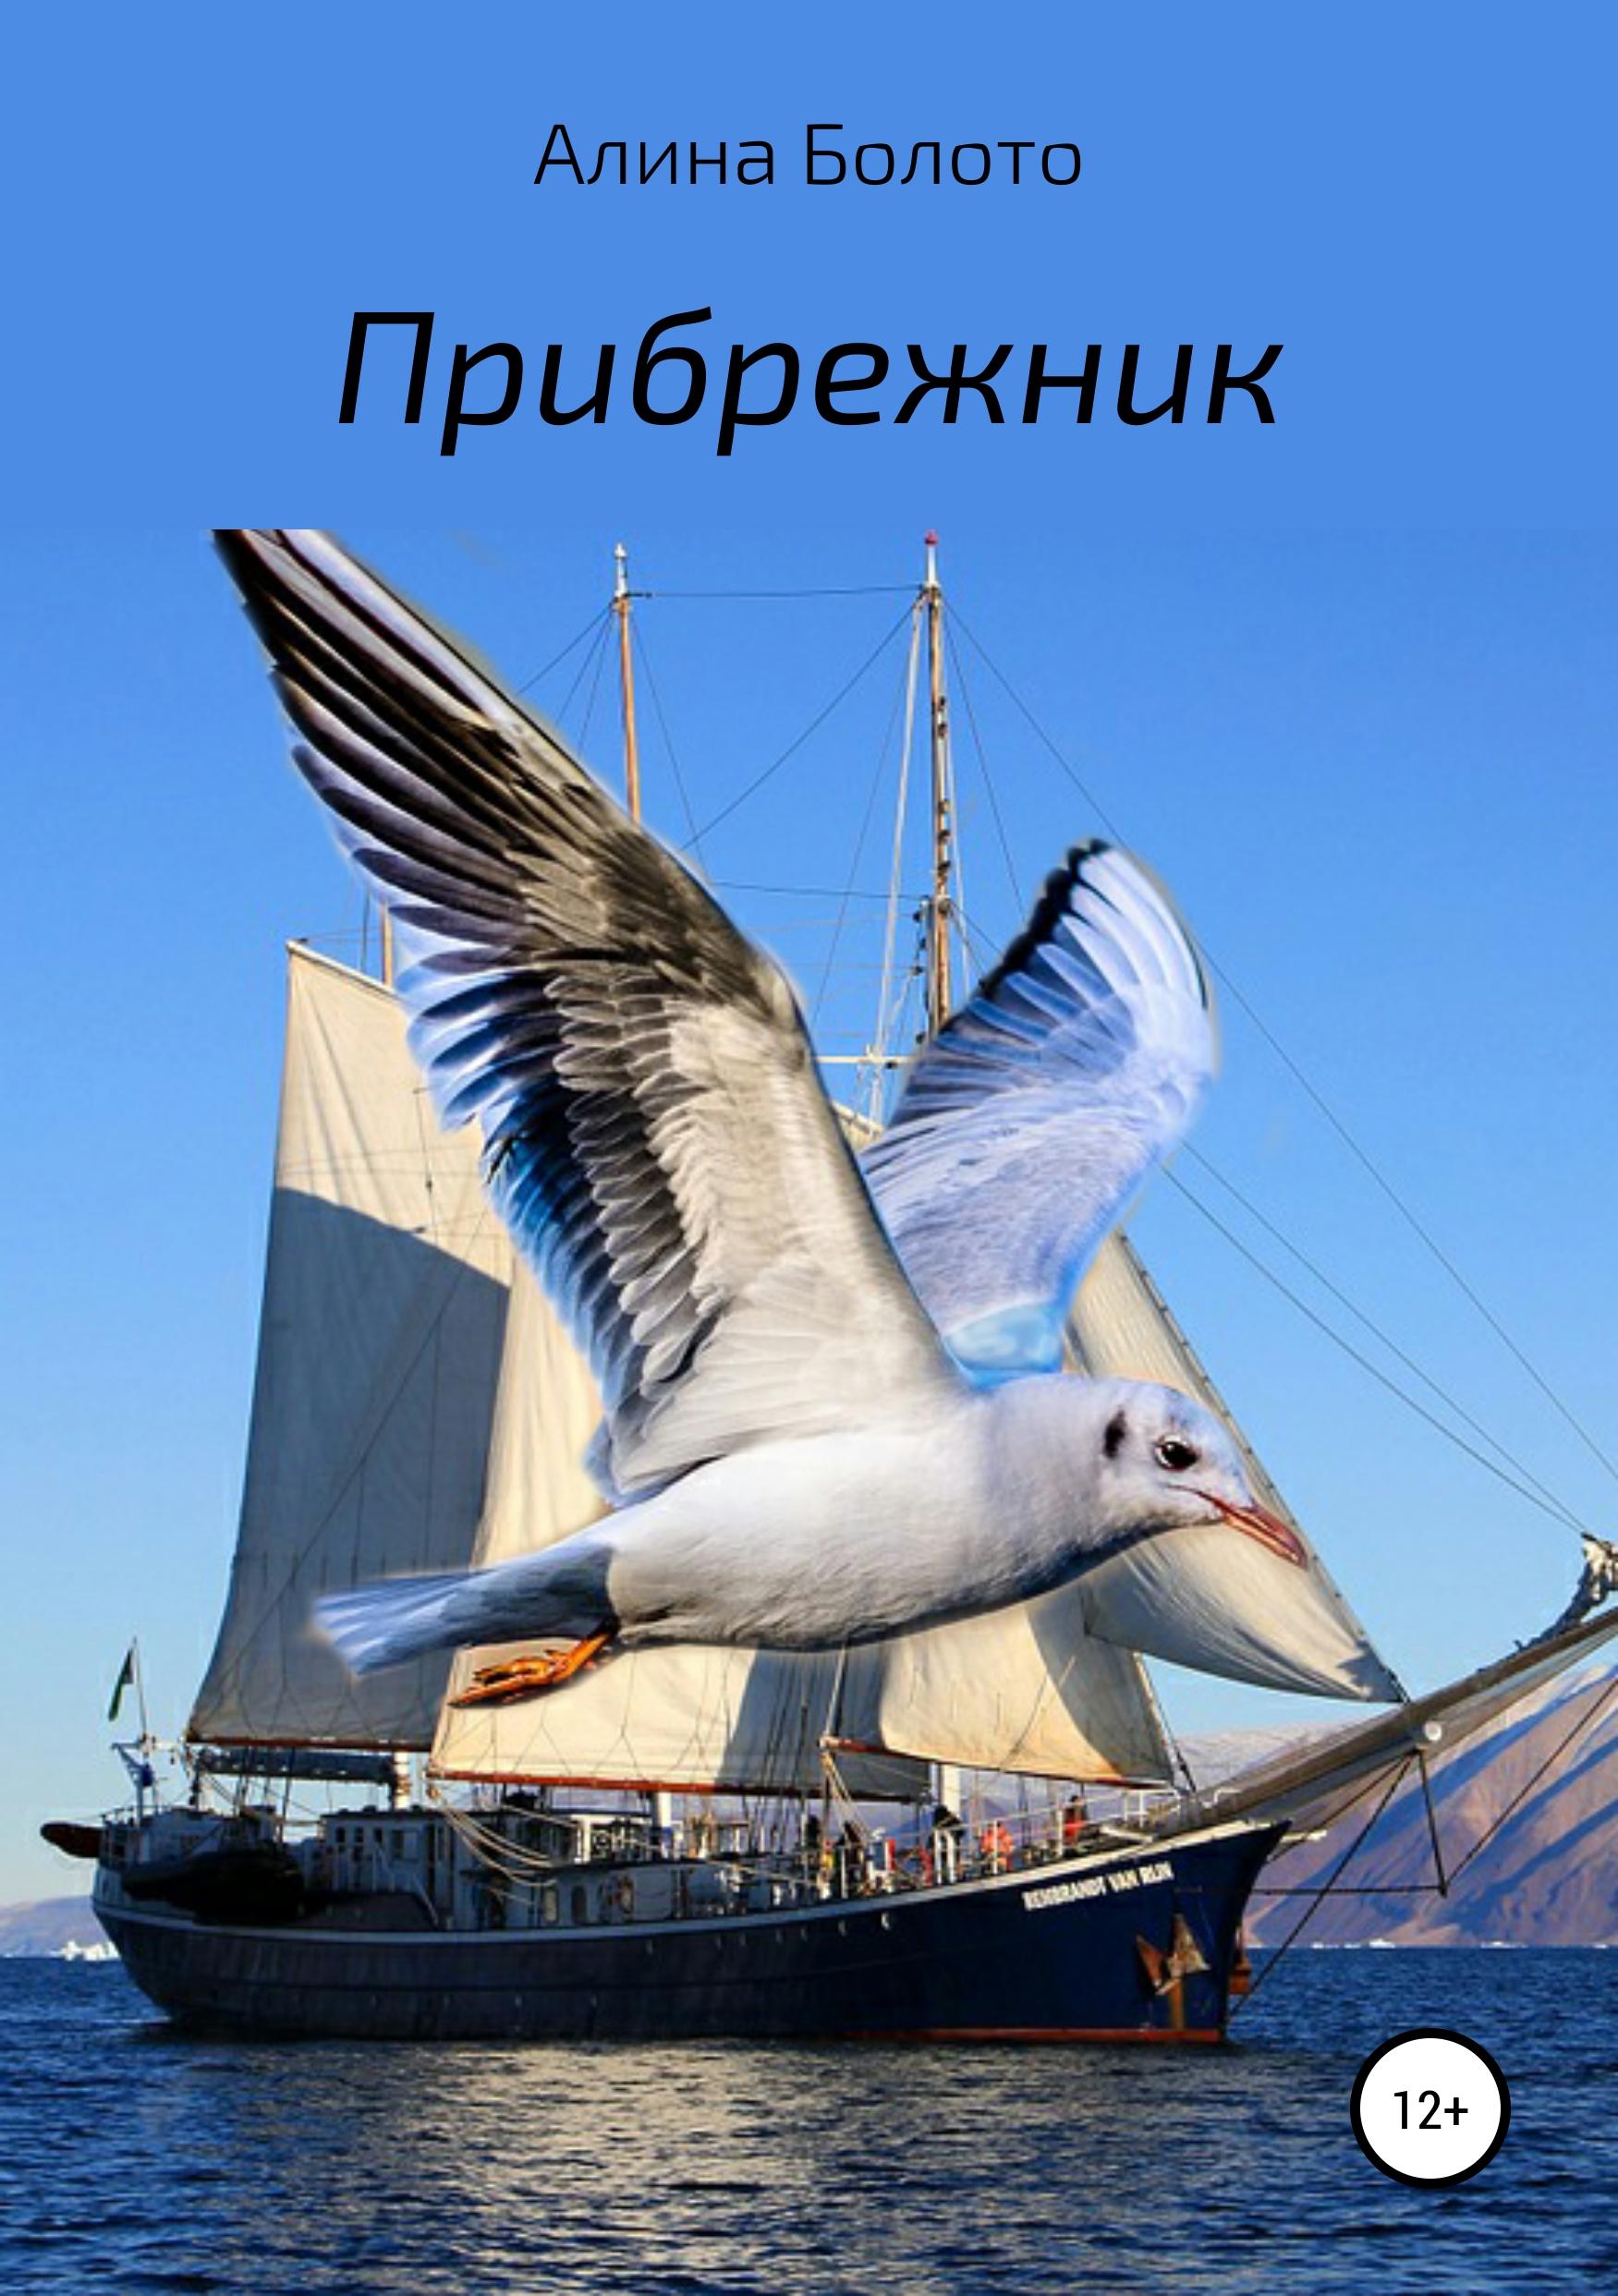 Алина Николаевна Болото Прибрежник